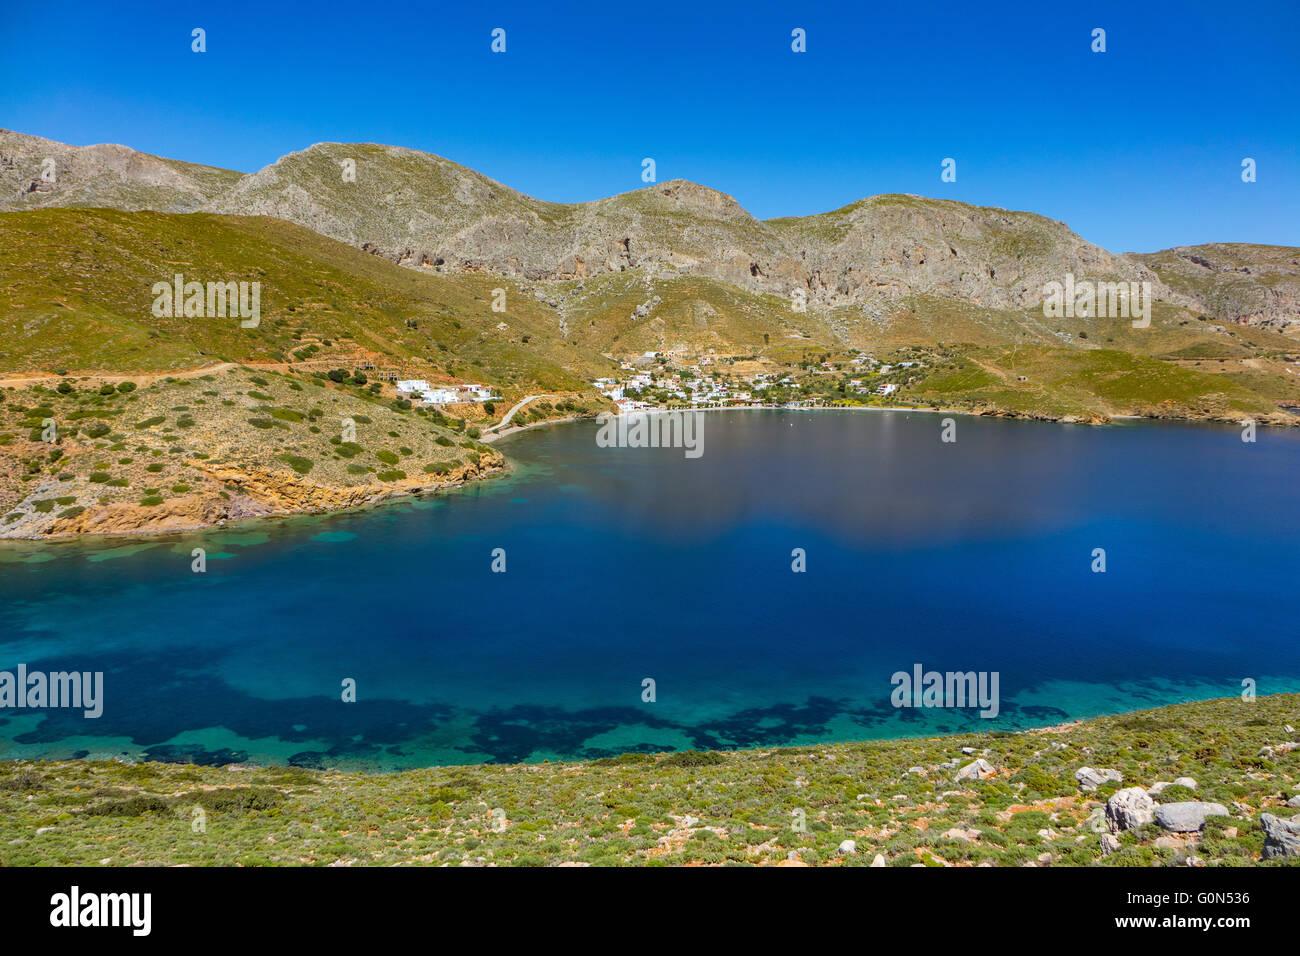 Blue sea and mountains at Emborios Bay Kalymnos, Greece - Stock Image